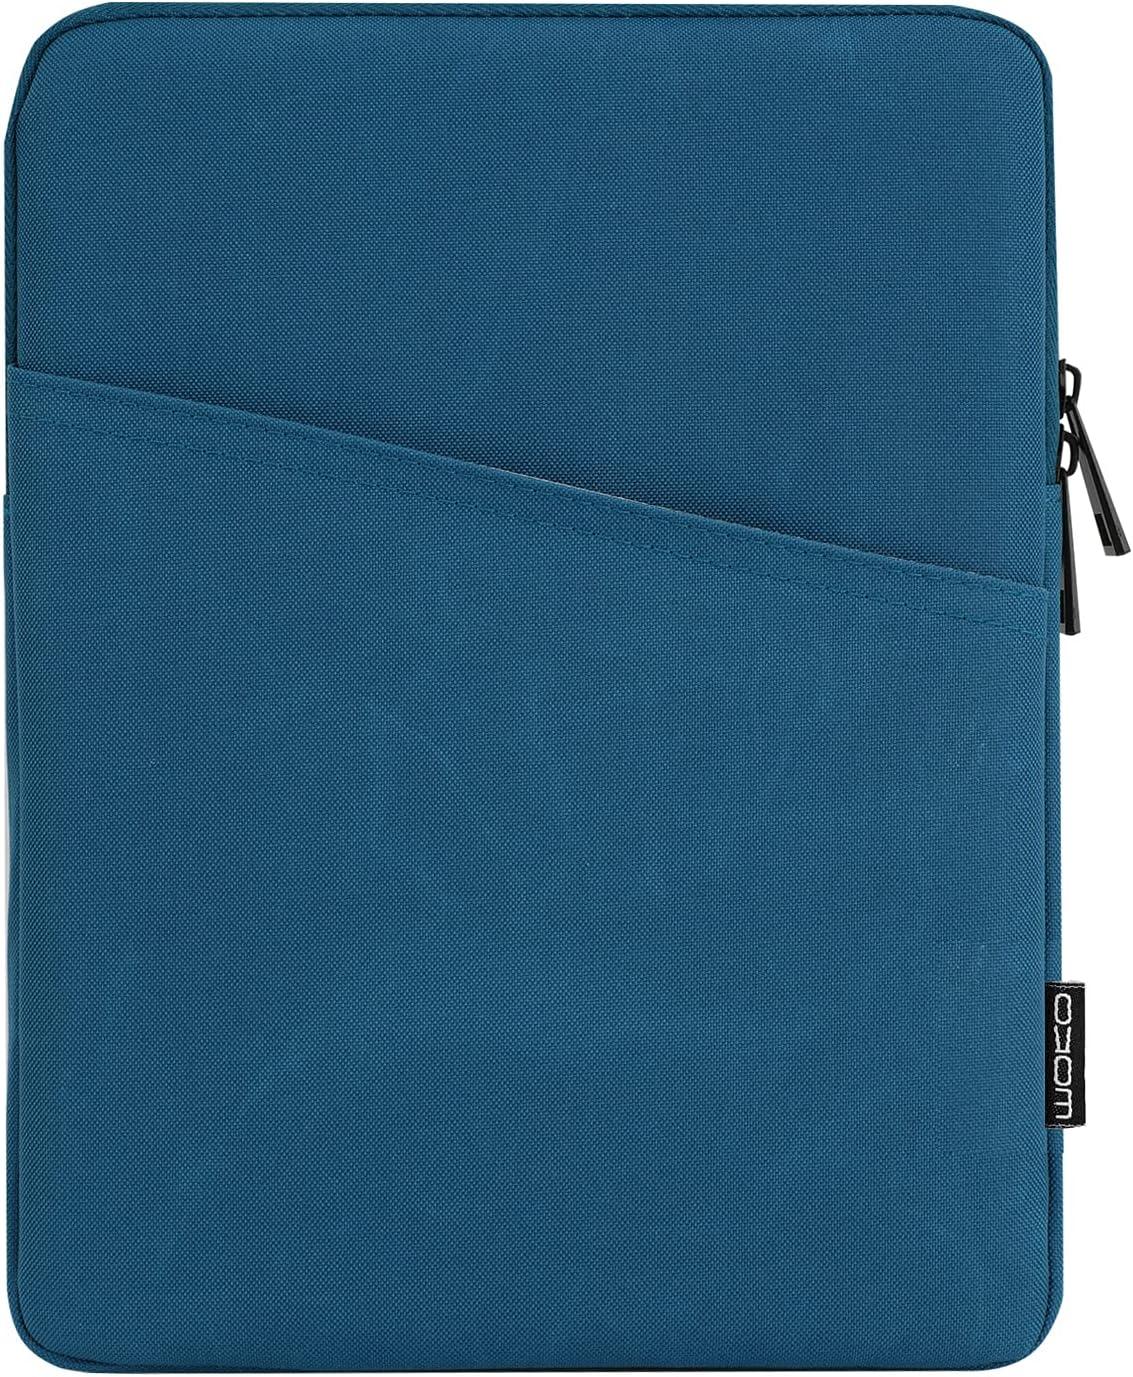 MoKo 9-11 Inch Tablet Sleeve Case Fits iPad Pro 11 2021/2020/2018, iPad 8th 7th Generation 10.2, iPad Air 4 10.9, iPad Air 3 10.5, iPad 9.7, Galaxy Tab A 10.1, Polyester Bag with Pocket, Peacock Blue